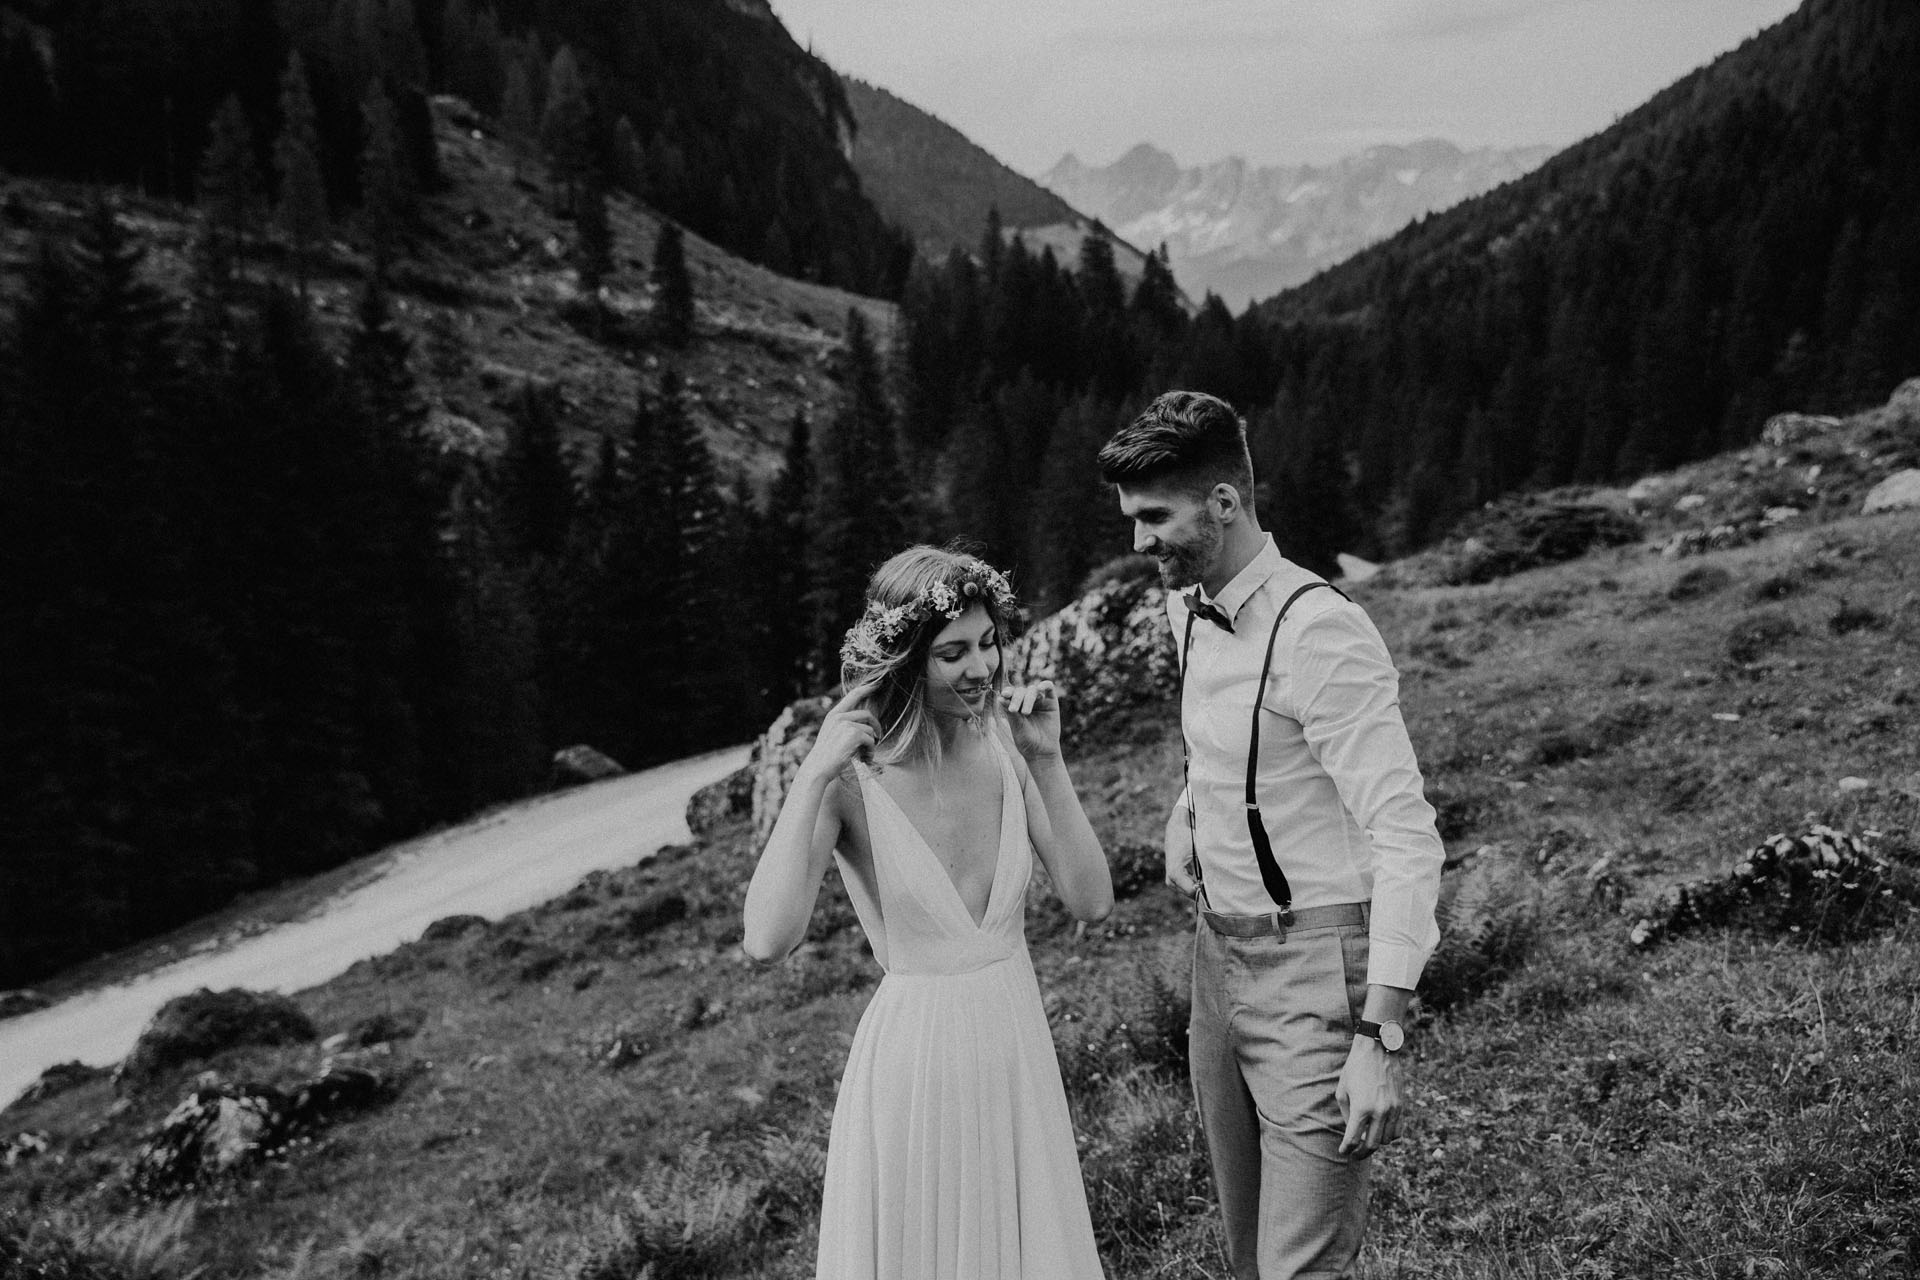 vienna-wedding-photographer-agnesundandi-weddingshooting-schladming-9